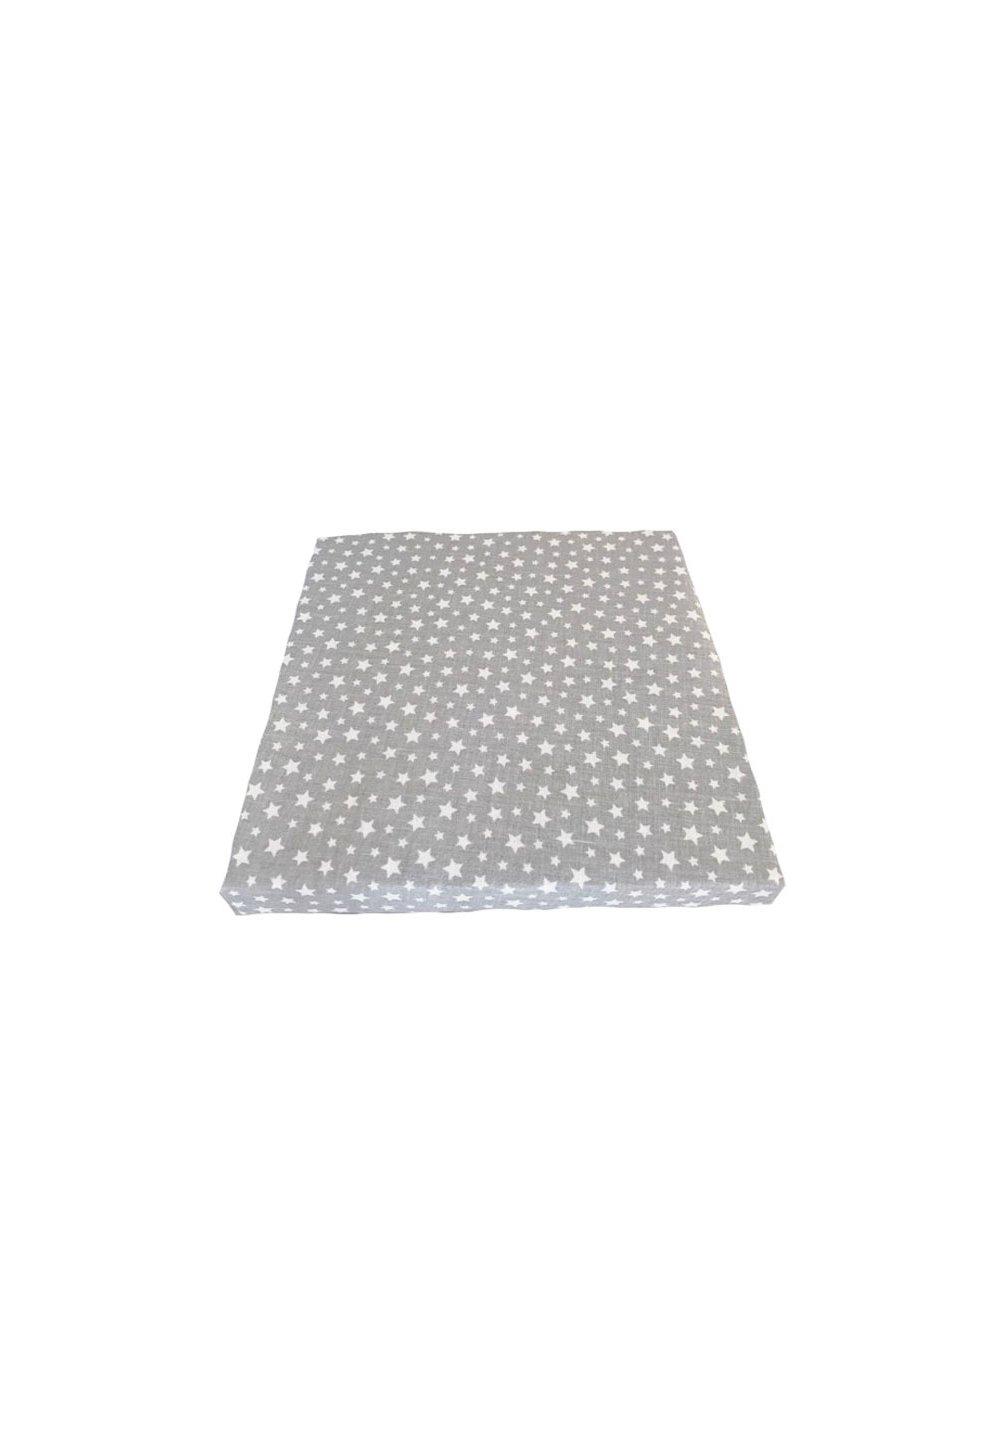 Cearceaf bumbac, gri cu stelute albe, 120x60 cm imagine